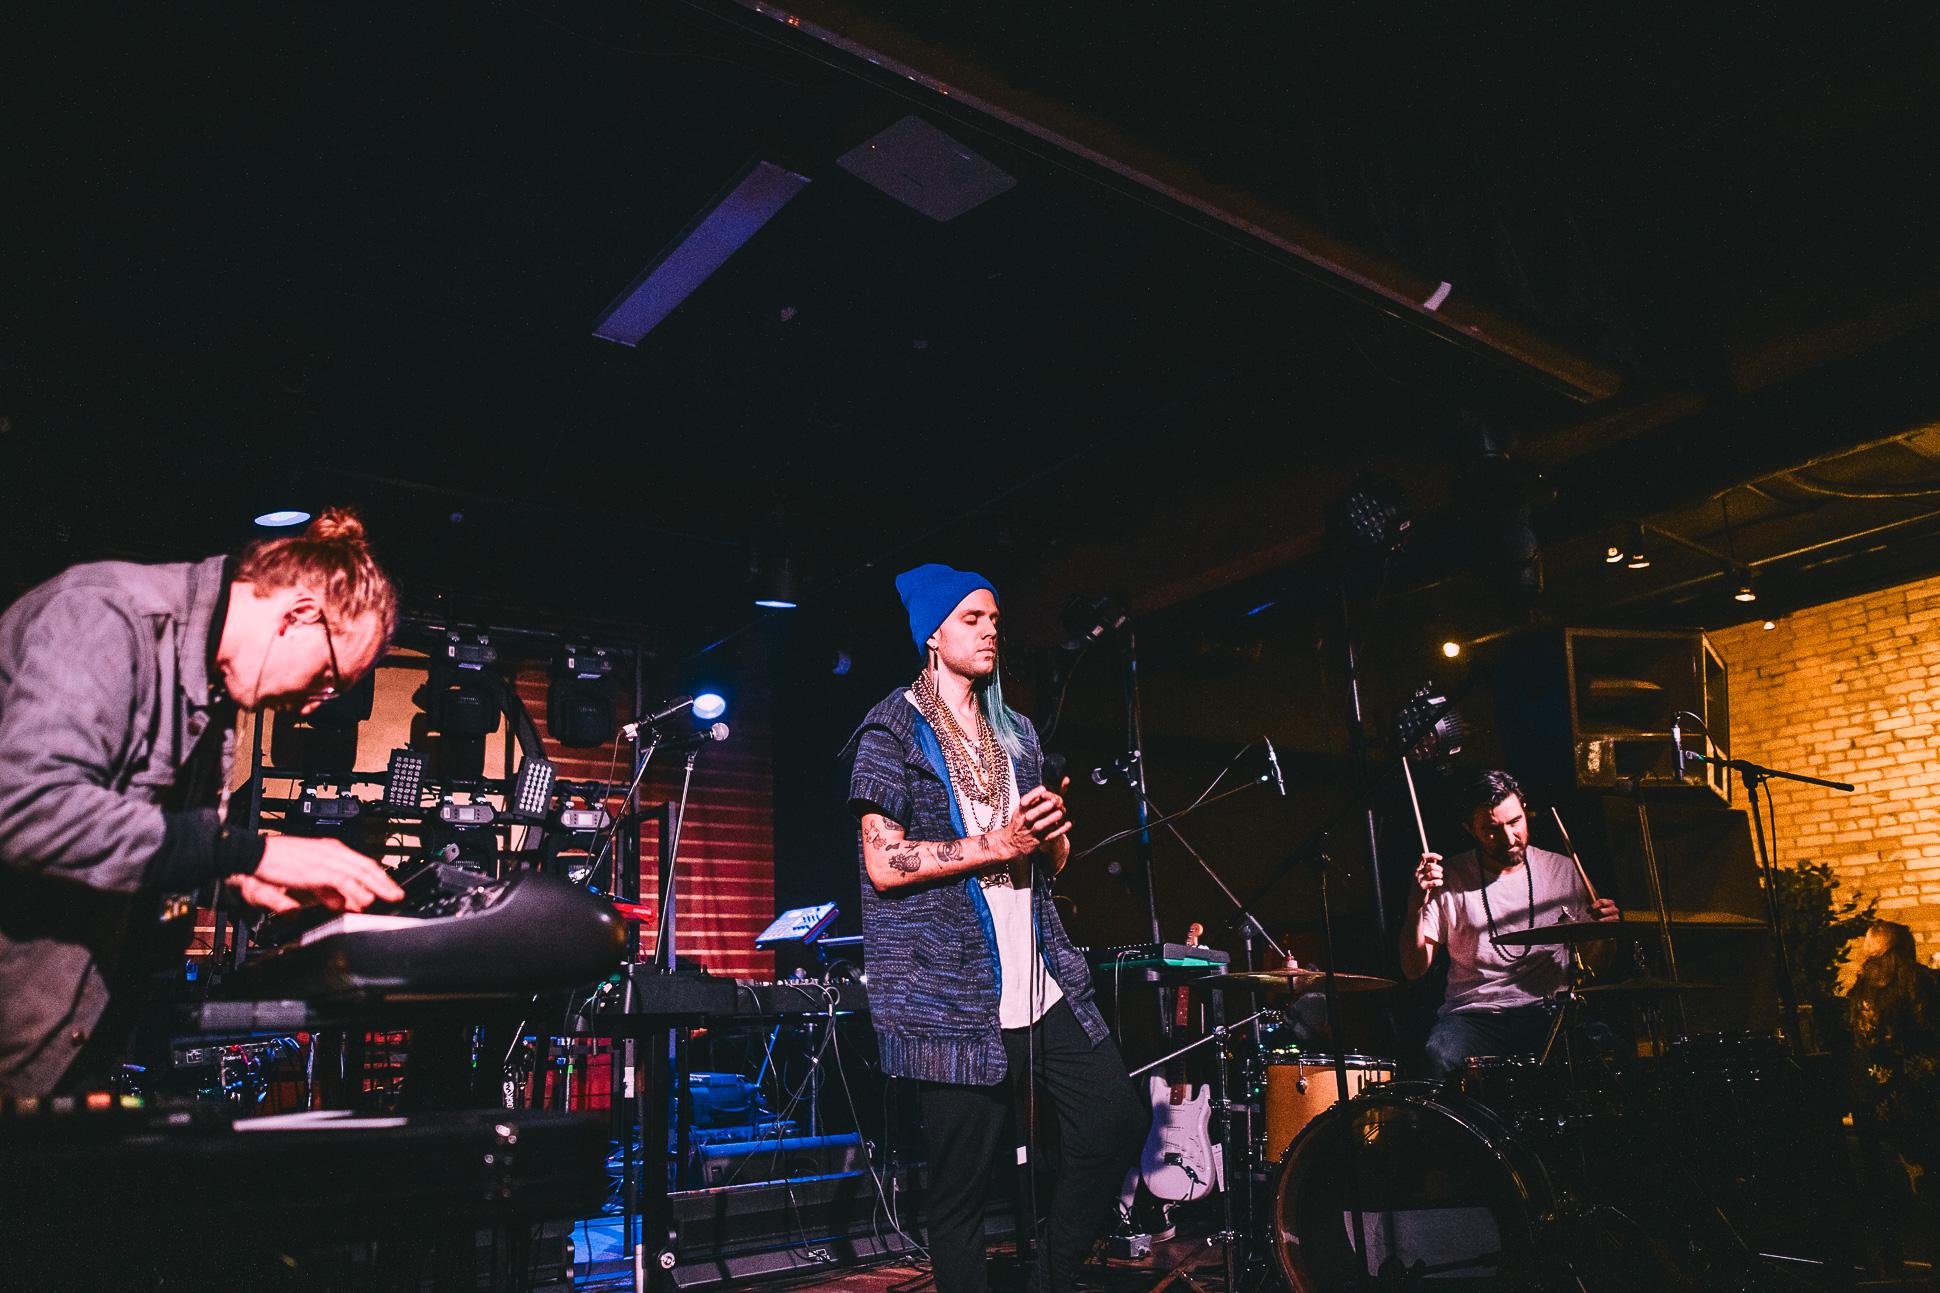 YoungAndSick-FortuneSoundClub-24-01-2019-Vancouver-01.jpg